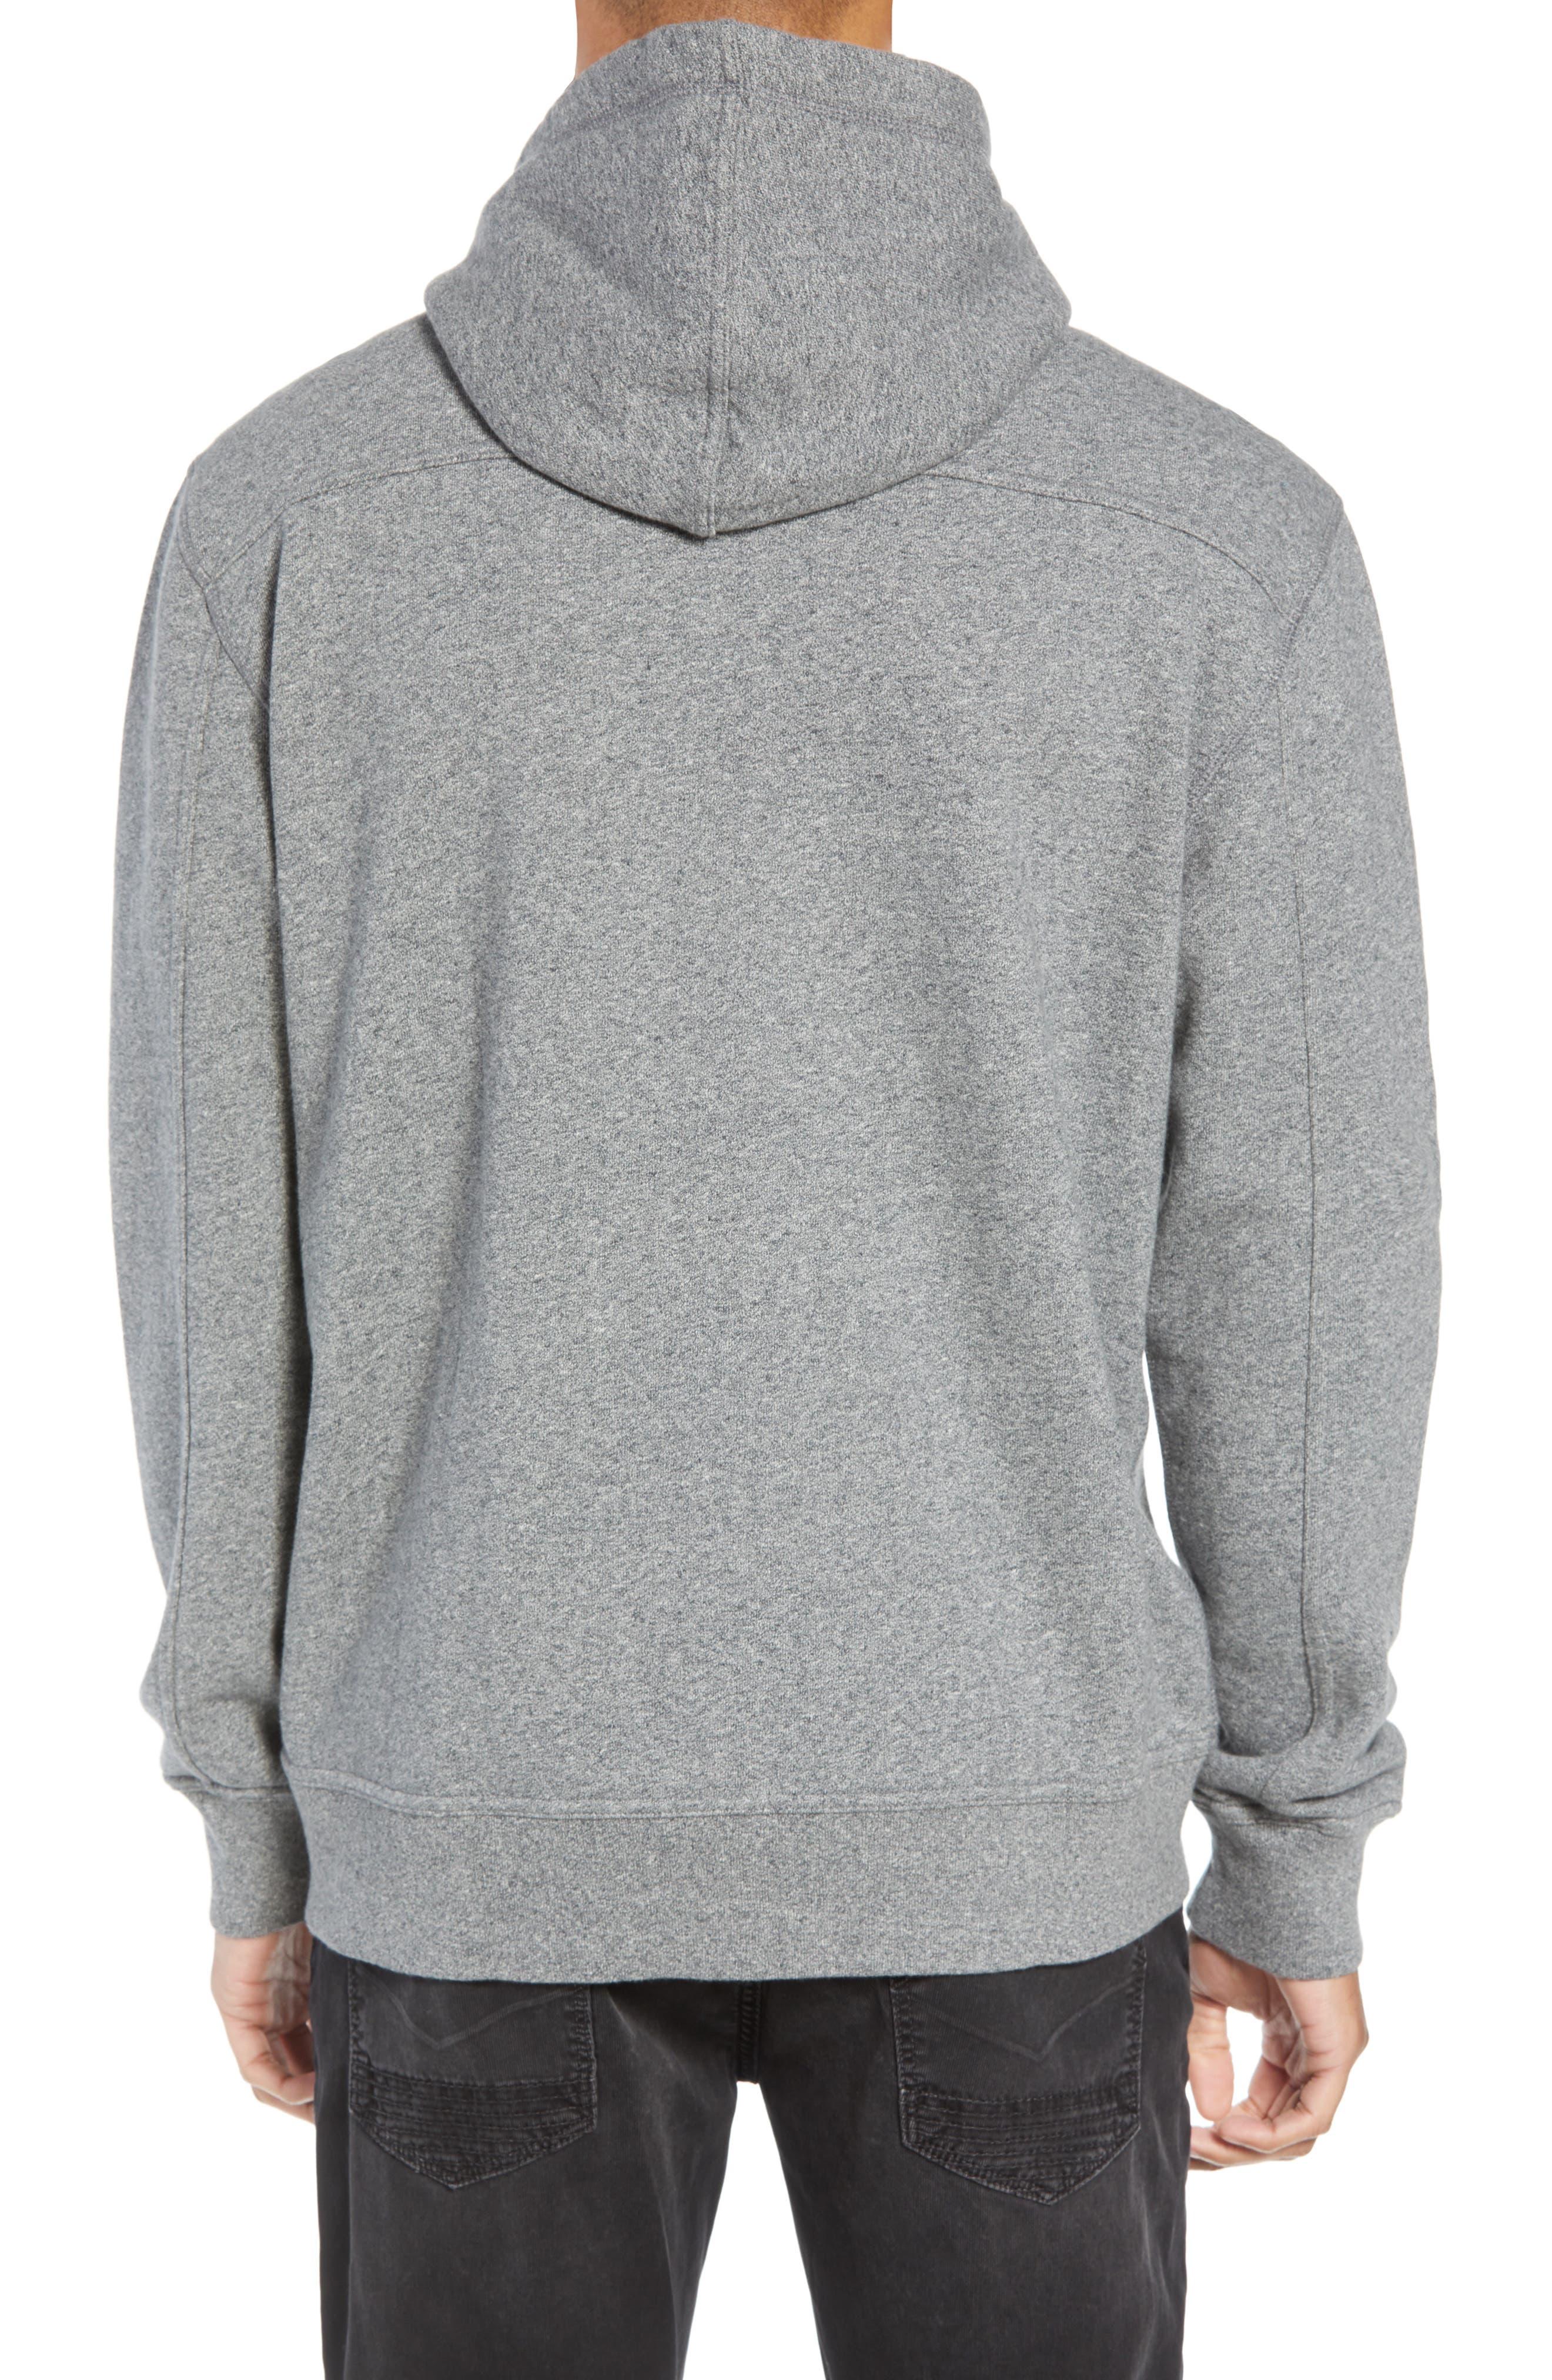 Regular Fit Hooded Zip Sweatshirt,                             Alternate thumbnail 2, color,                             HEATHER GREY